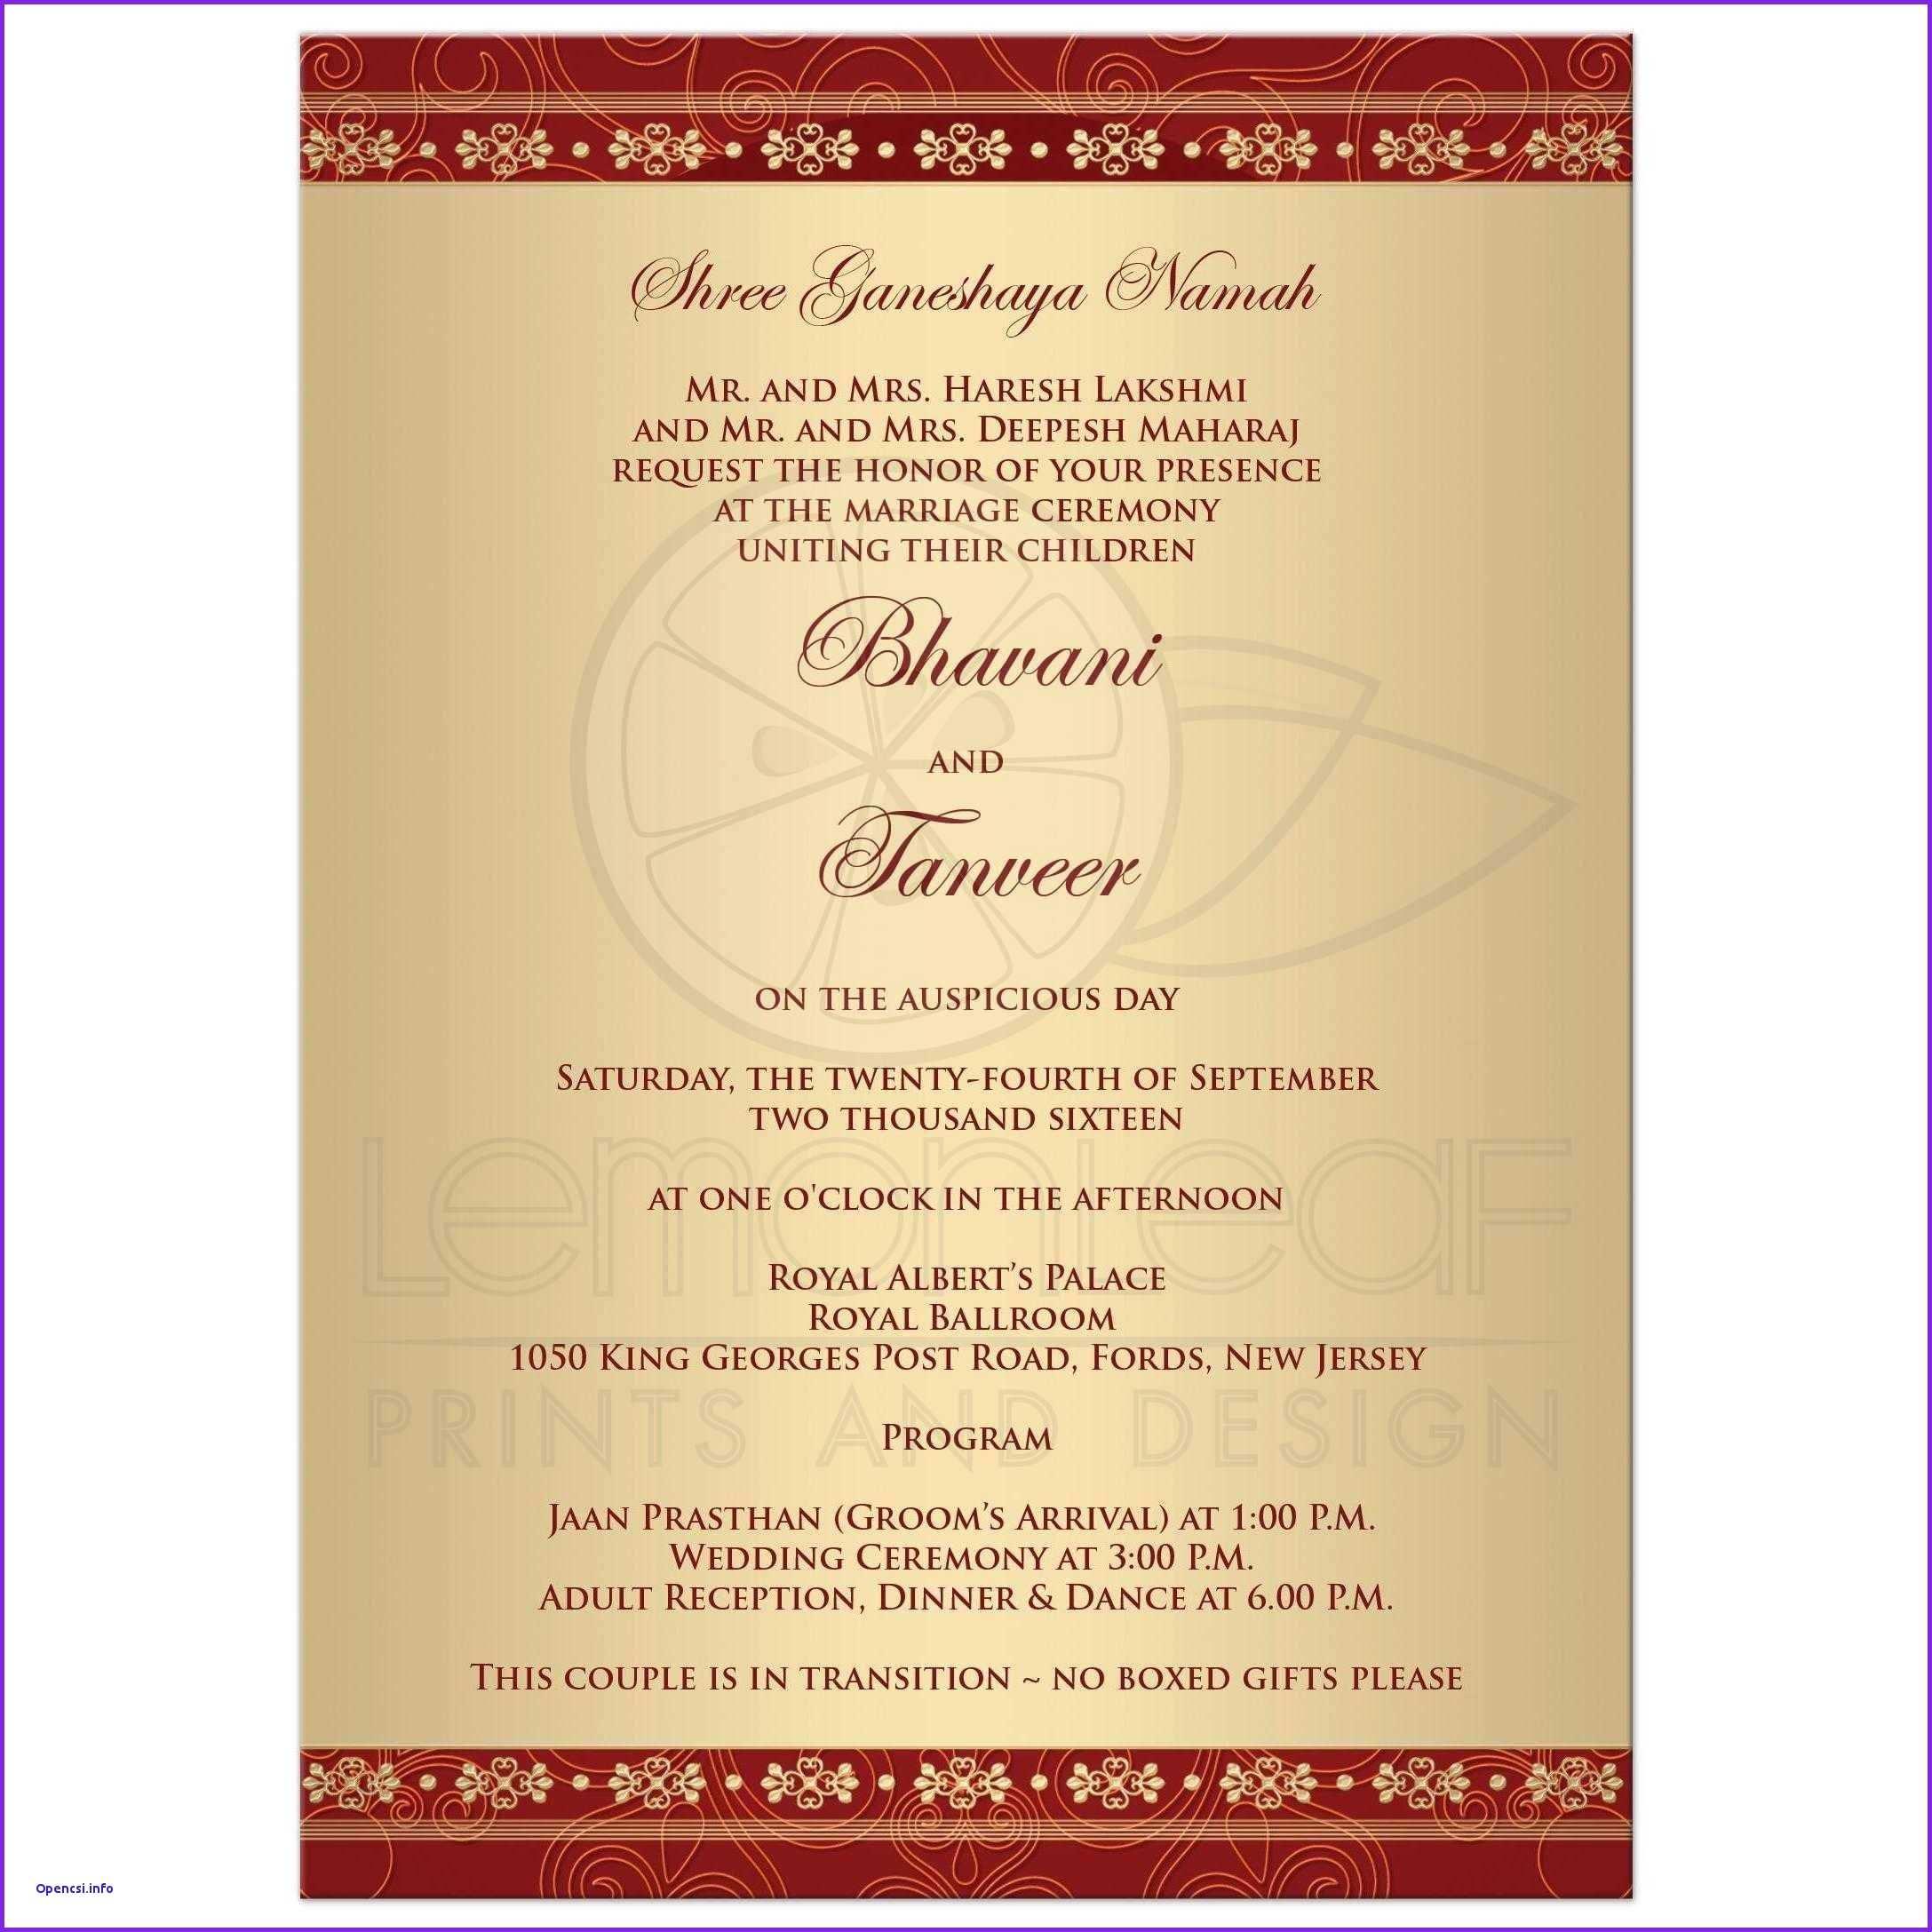 17 Printable Invitation Cards Samples Wedding Maker by Invitation Cards  Samples Wedding - Cards Design Templates